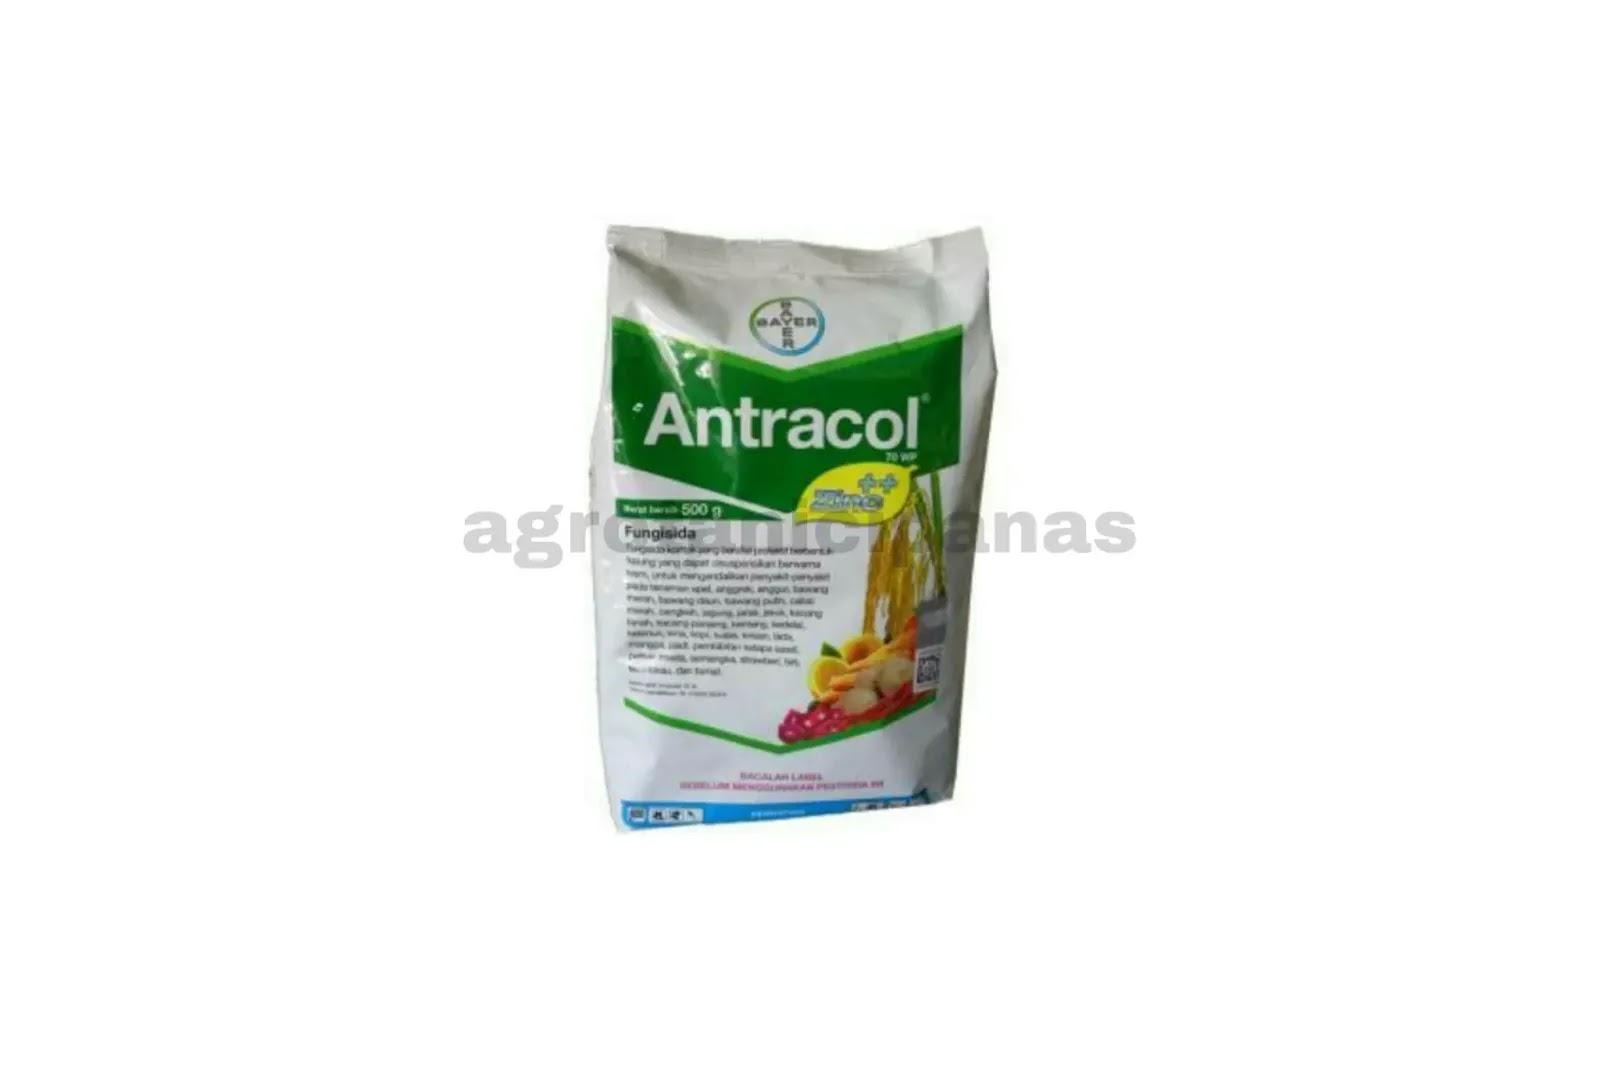 9 Manfaat Fungisida Antracol 70wp Untuk Mengendalikan Penyakit Jamur Berita Pertanian Mitalom